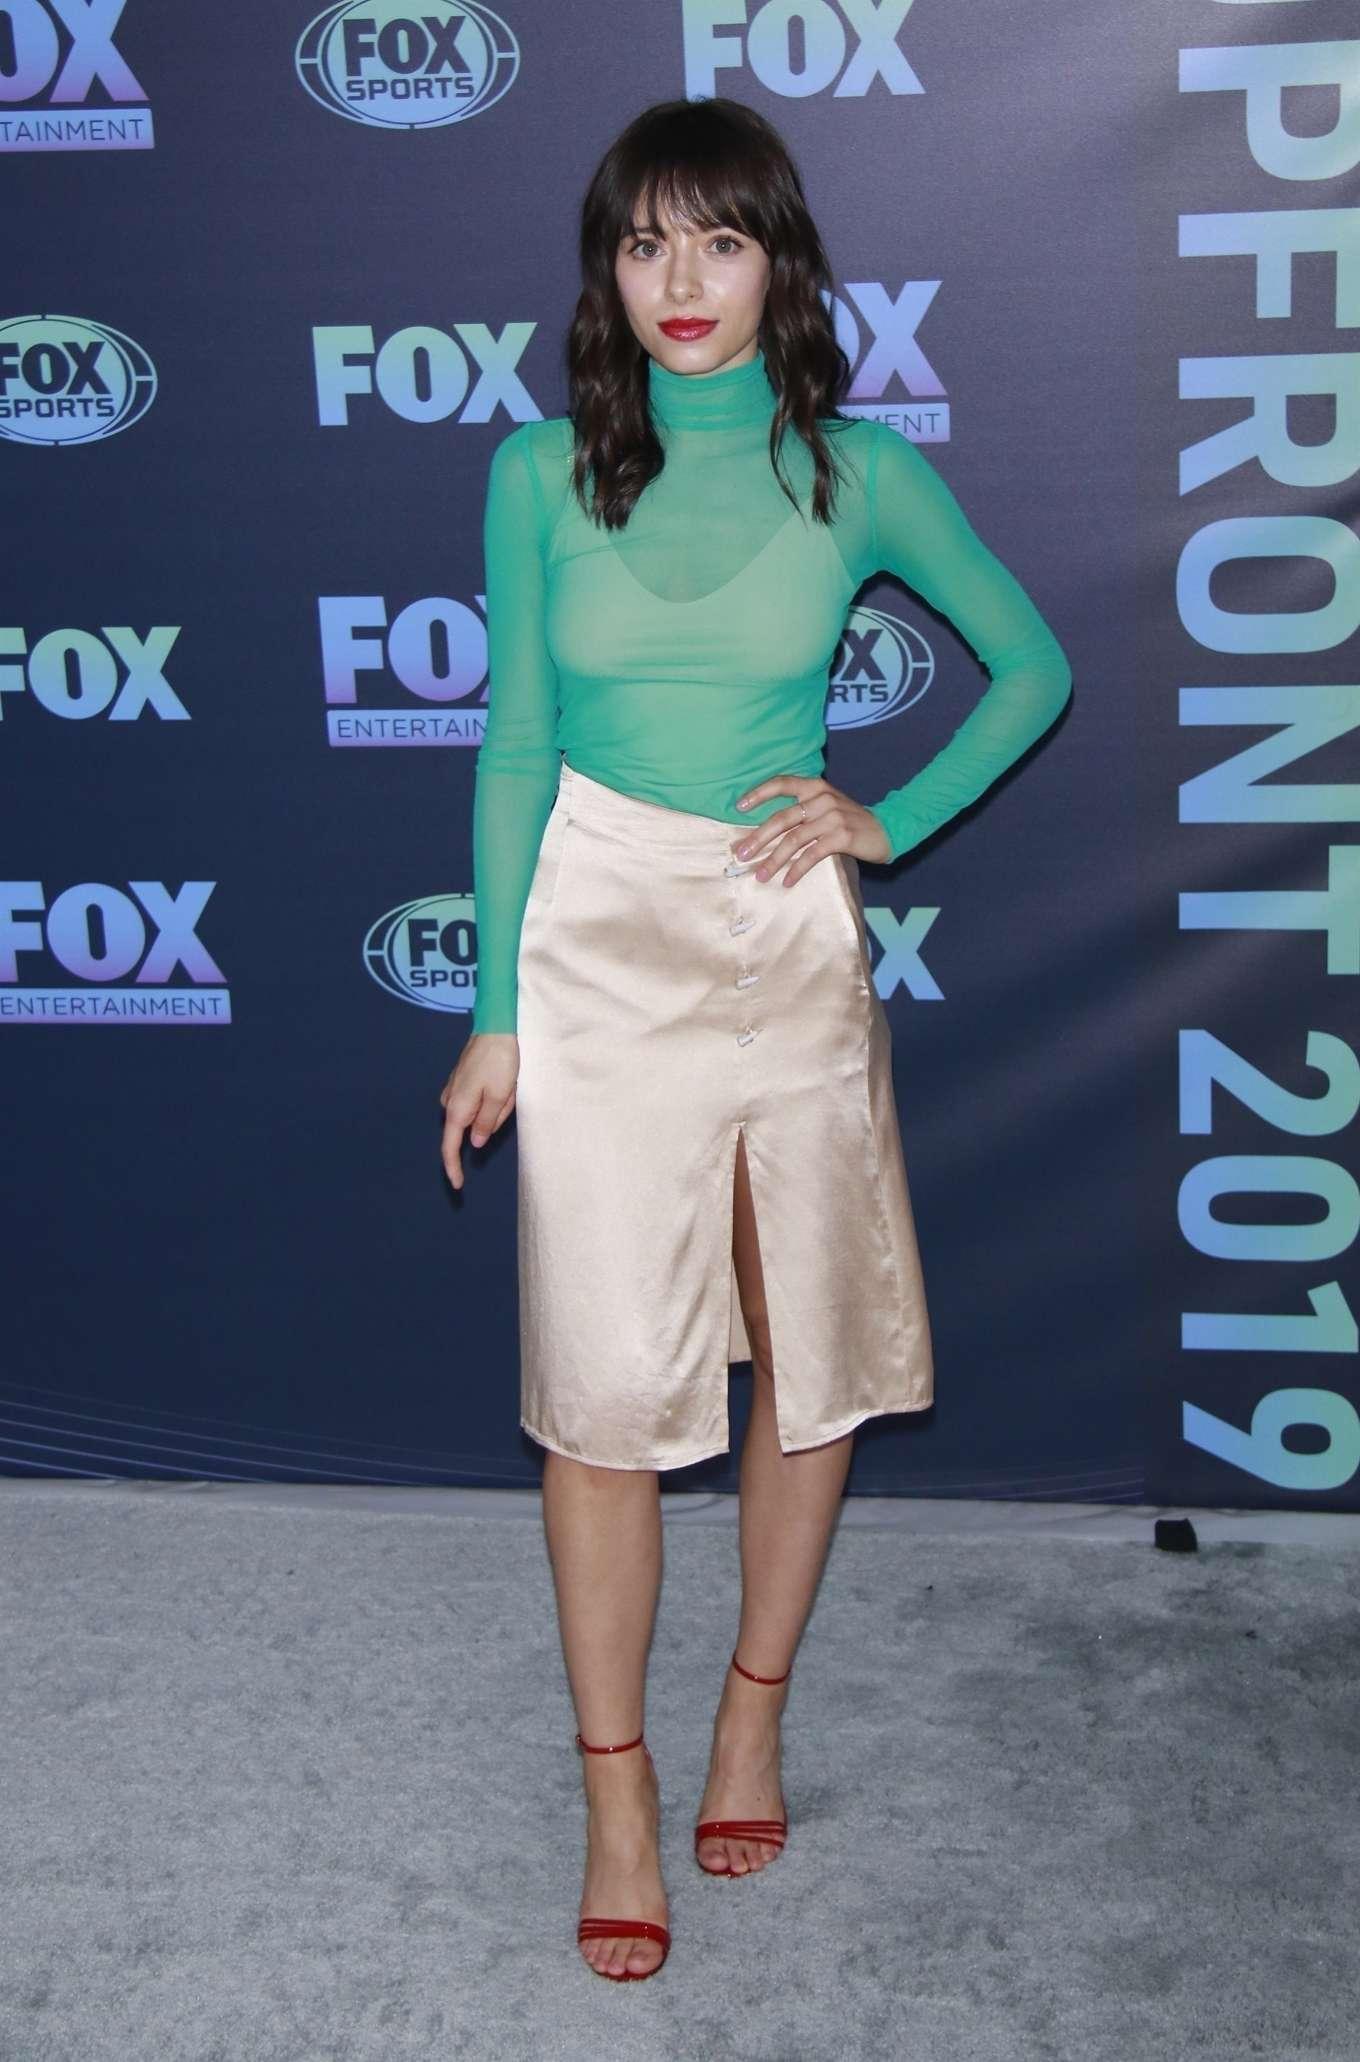 Elizabeth Cappuccino 2019 : Elizabeth Cappuccino: Fox Upfront Presentation-14